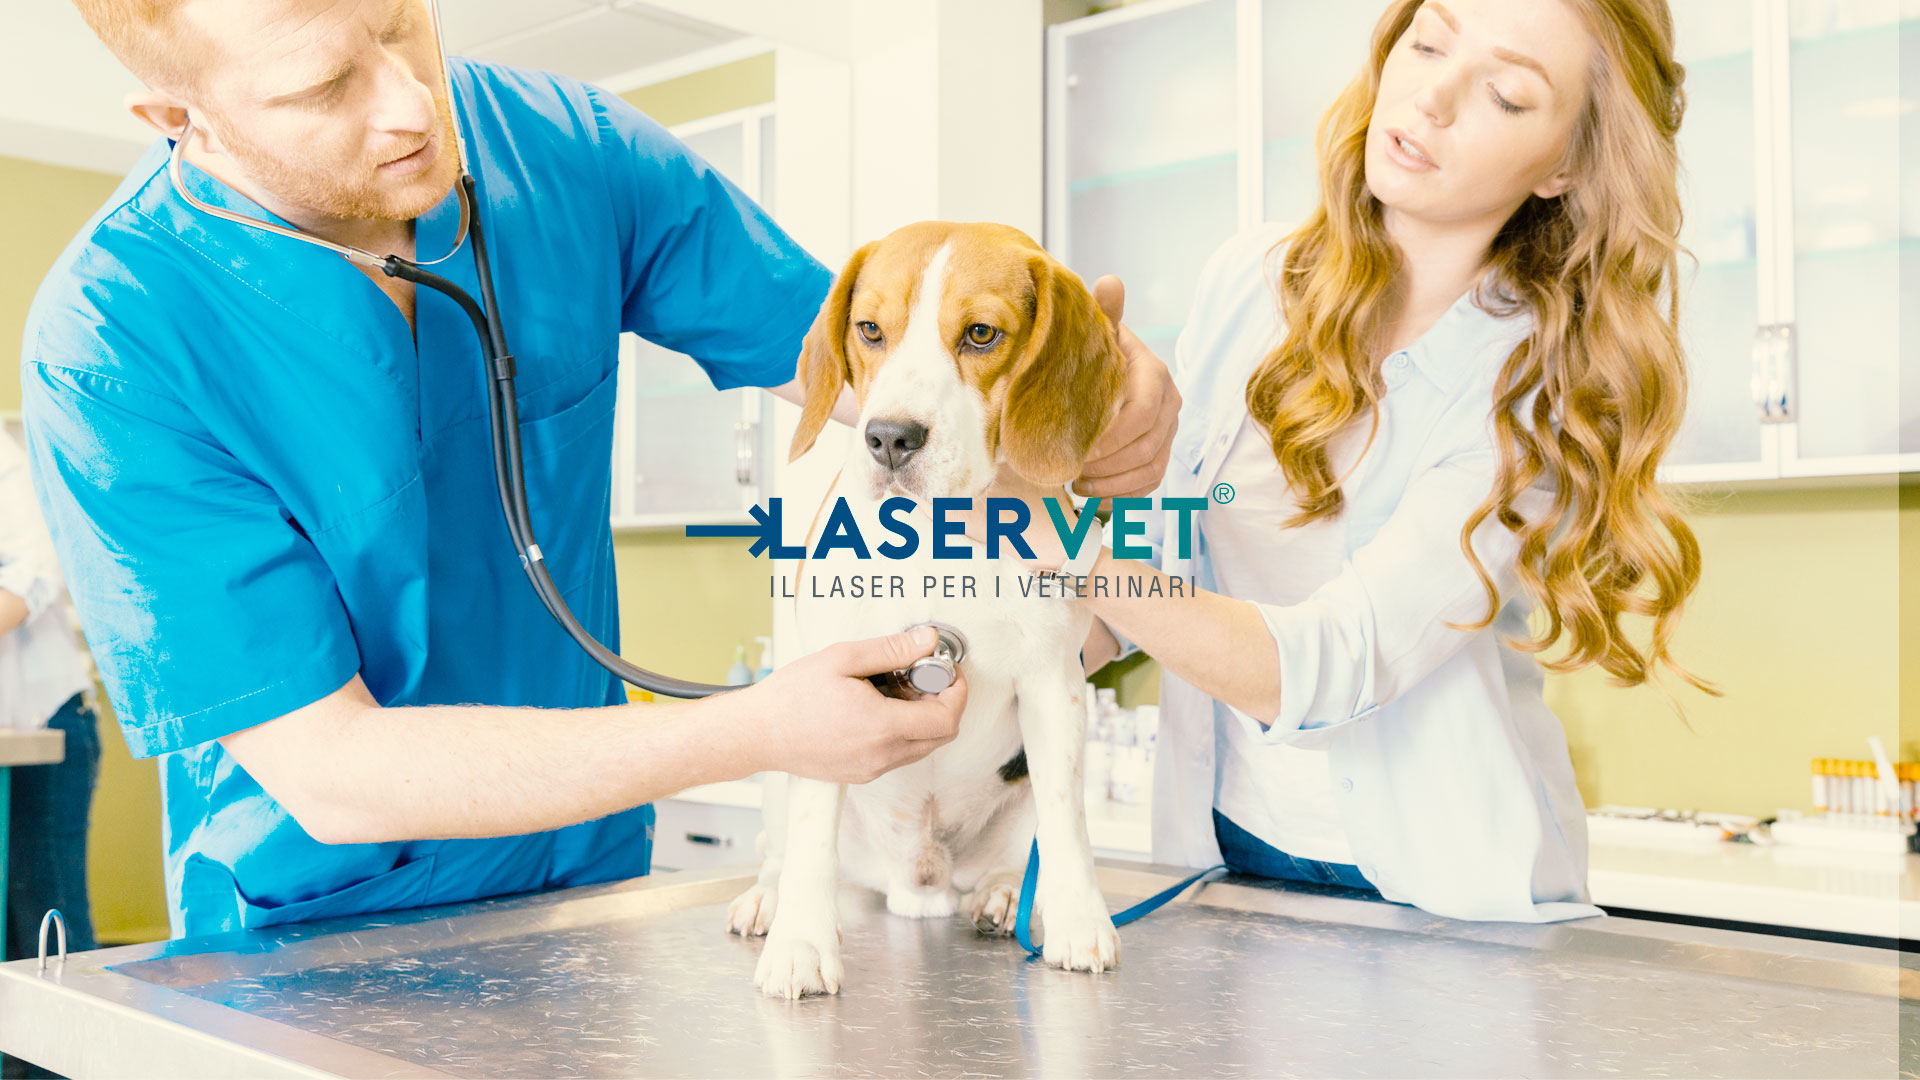 Studio FLO per Laservet: restyling immagine e logo